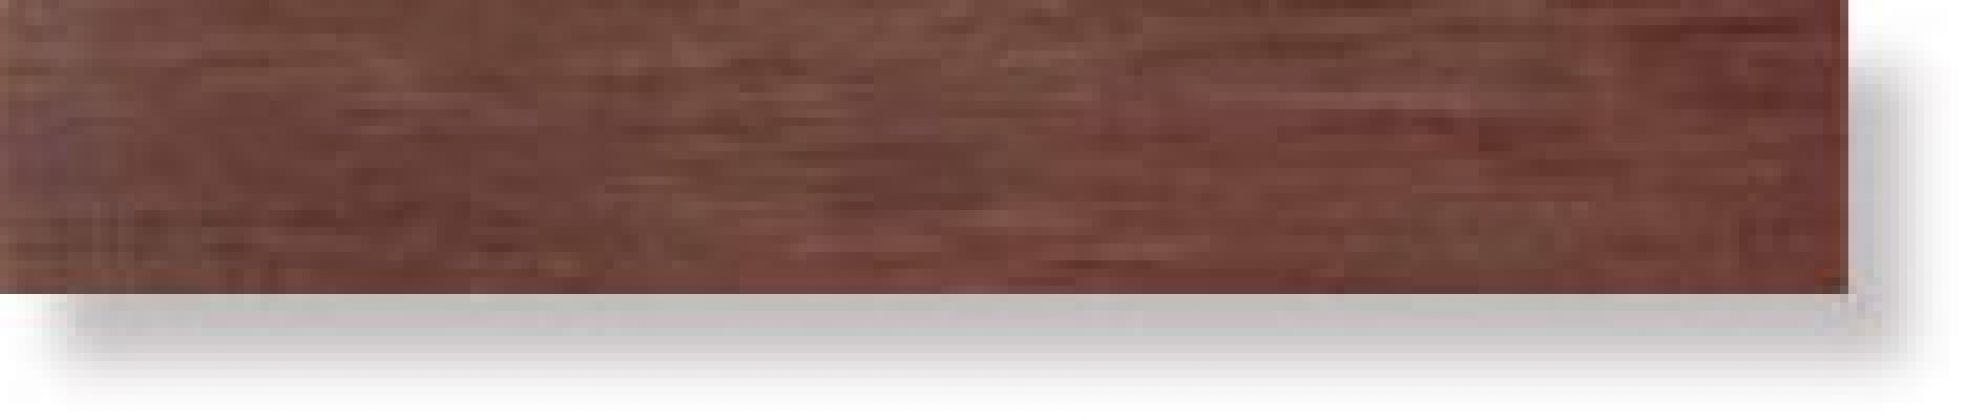 Плитка Merbau/15/R 15x90